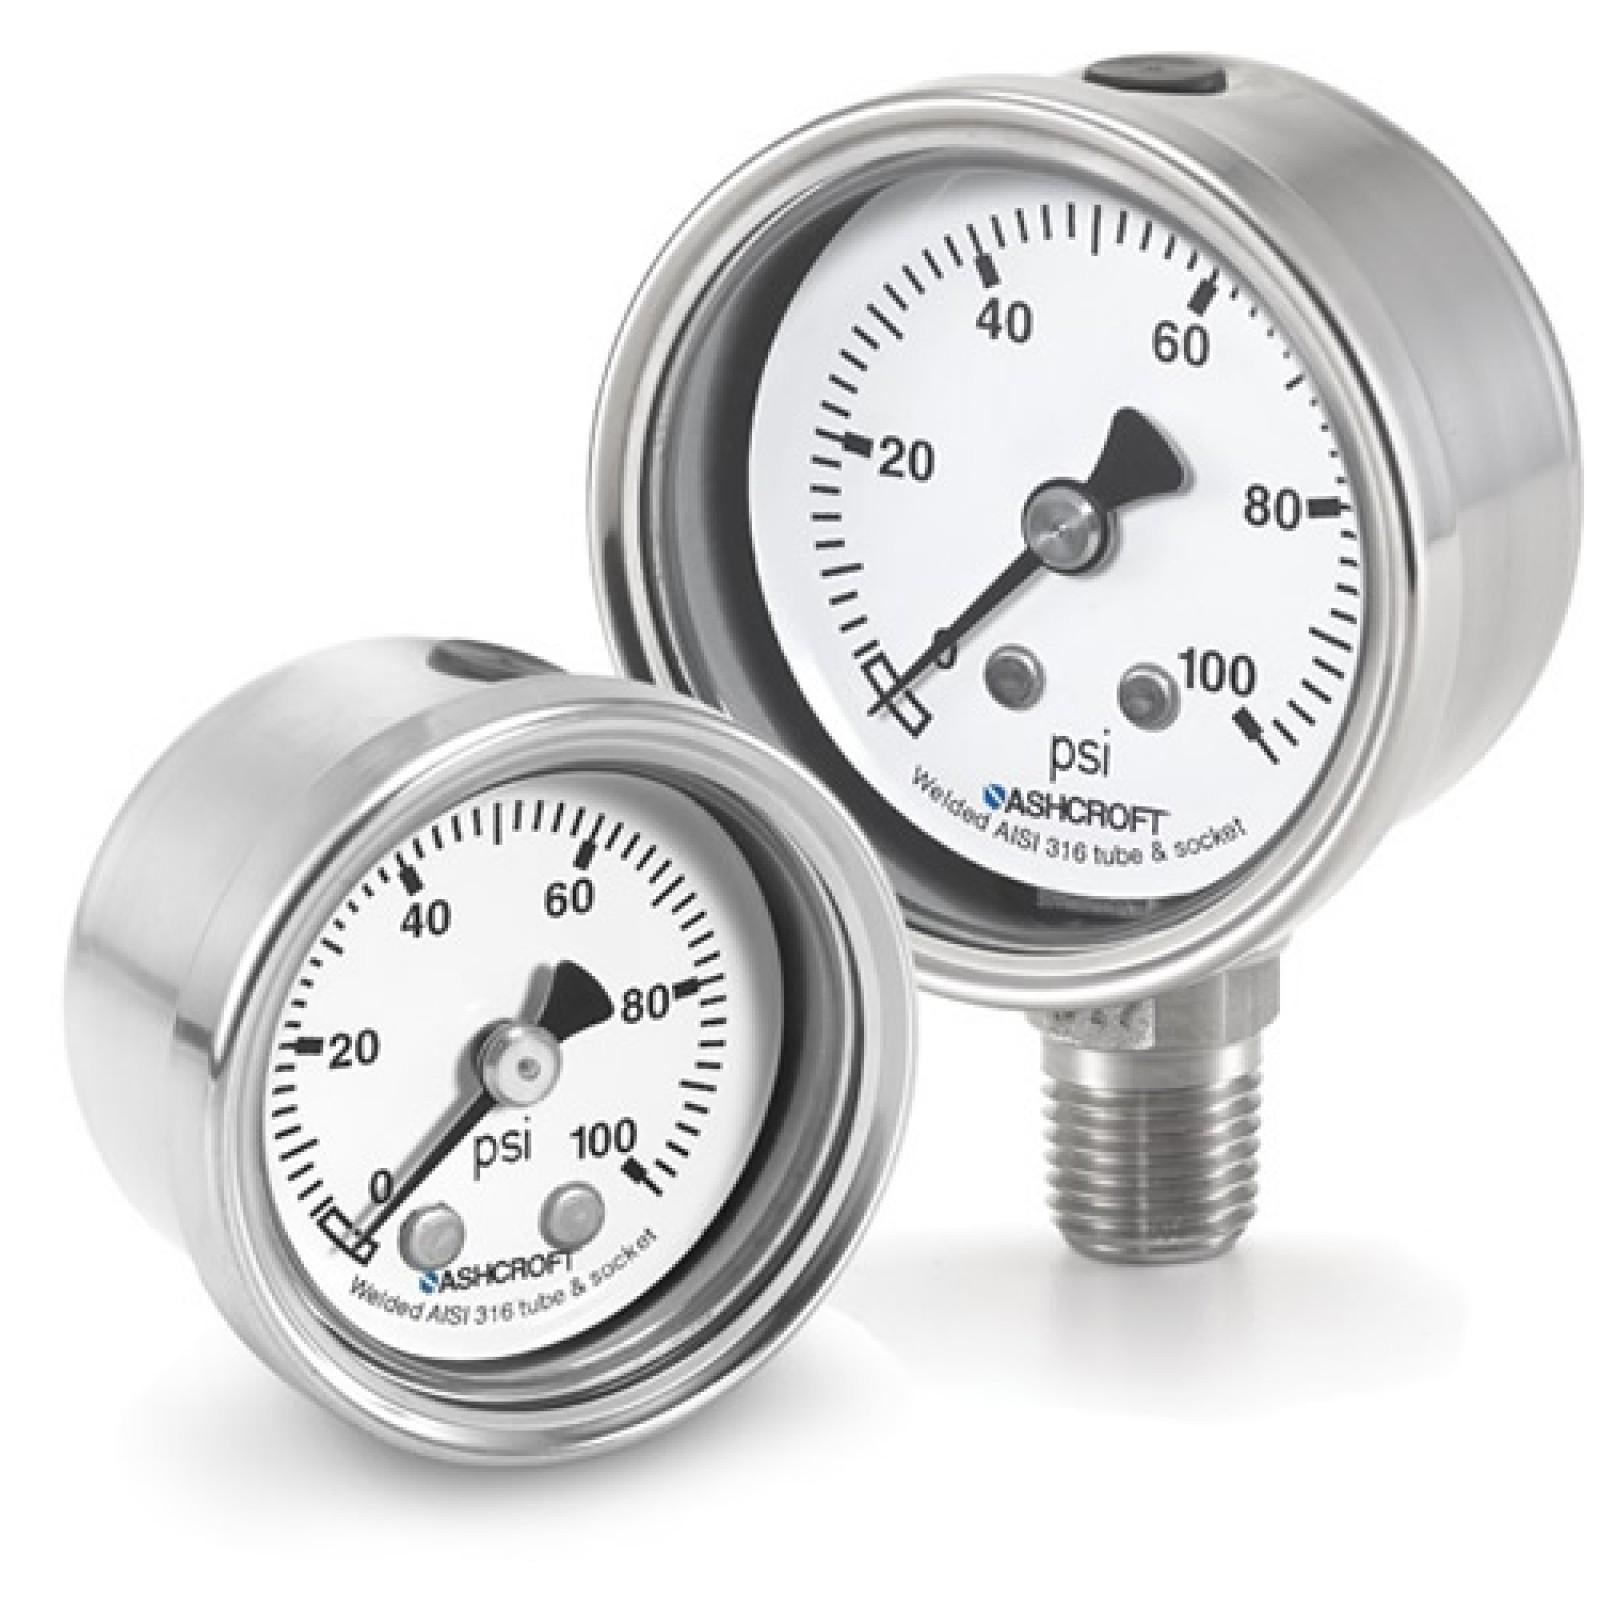 "63 1008S 02L 200#/KP - Pressure Gauge, 63mm stainless 1/4"" NPT Lower conn & Case, 0/200 psi"